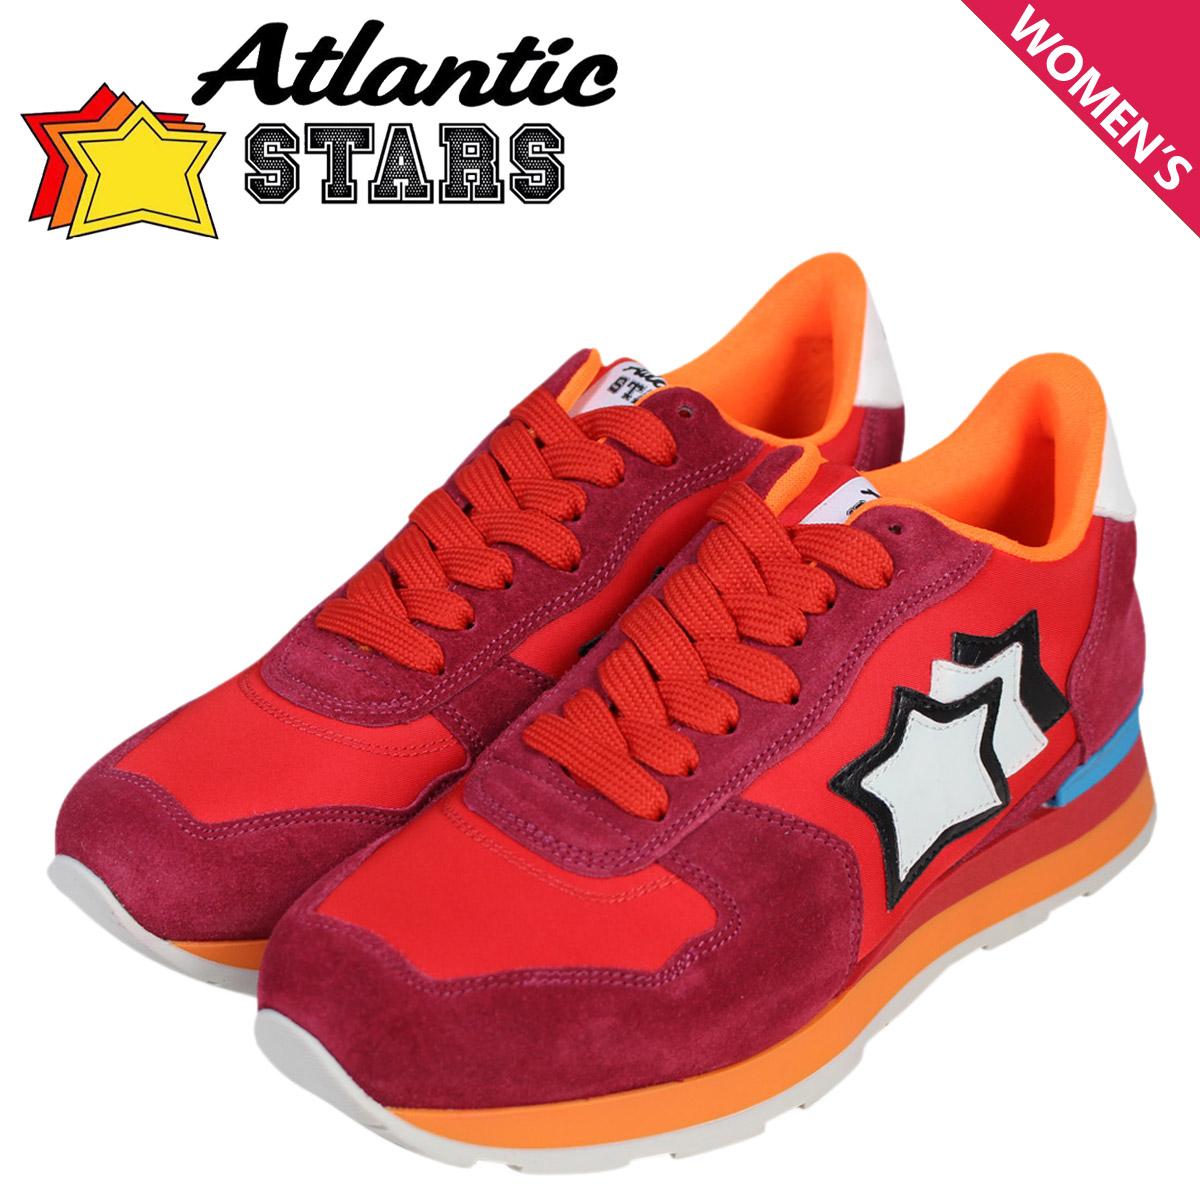 Atlantic STARS アトランティックスターズ スニーカー レディース ベガ VEGA レッド 赤 FRA-85C